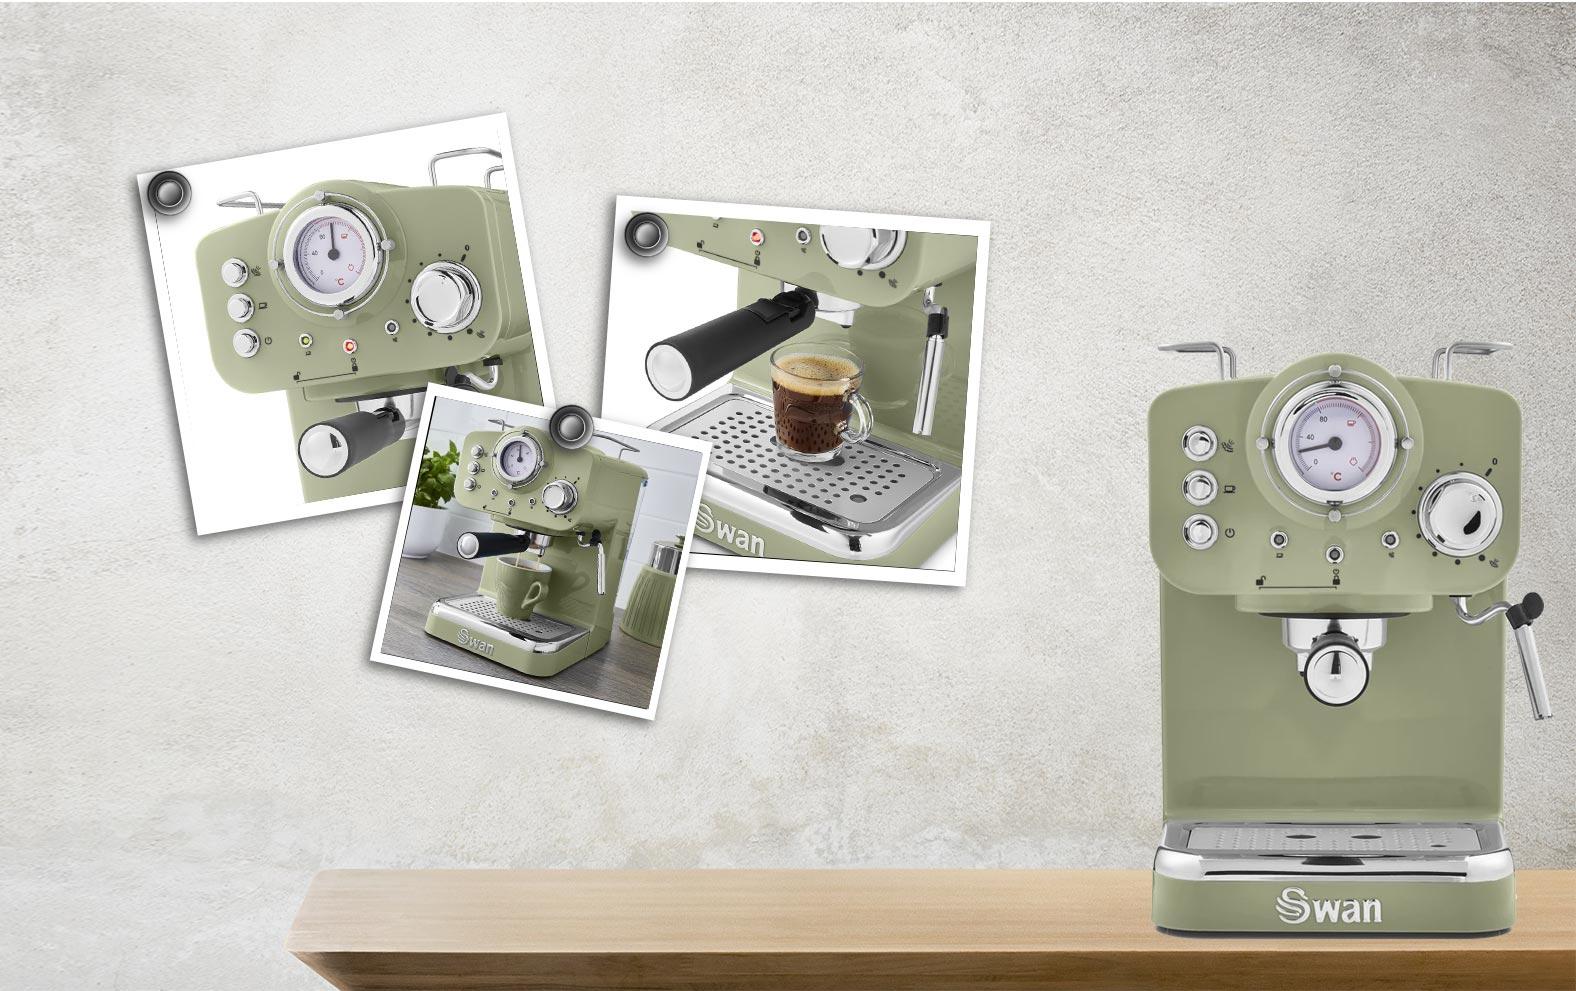 Swan Pump Espresso Coffee Machine - Πράσινο - - SK22110GN